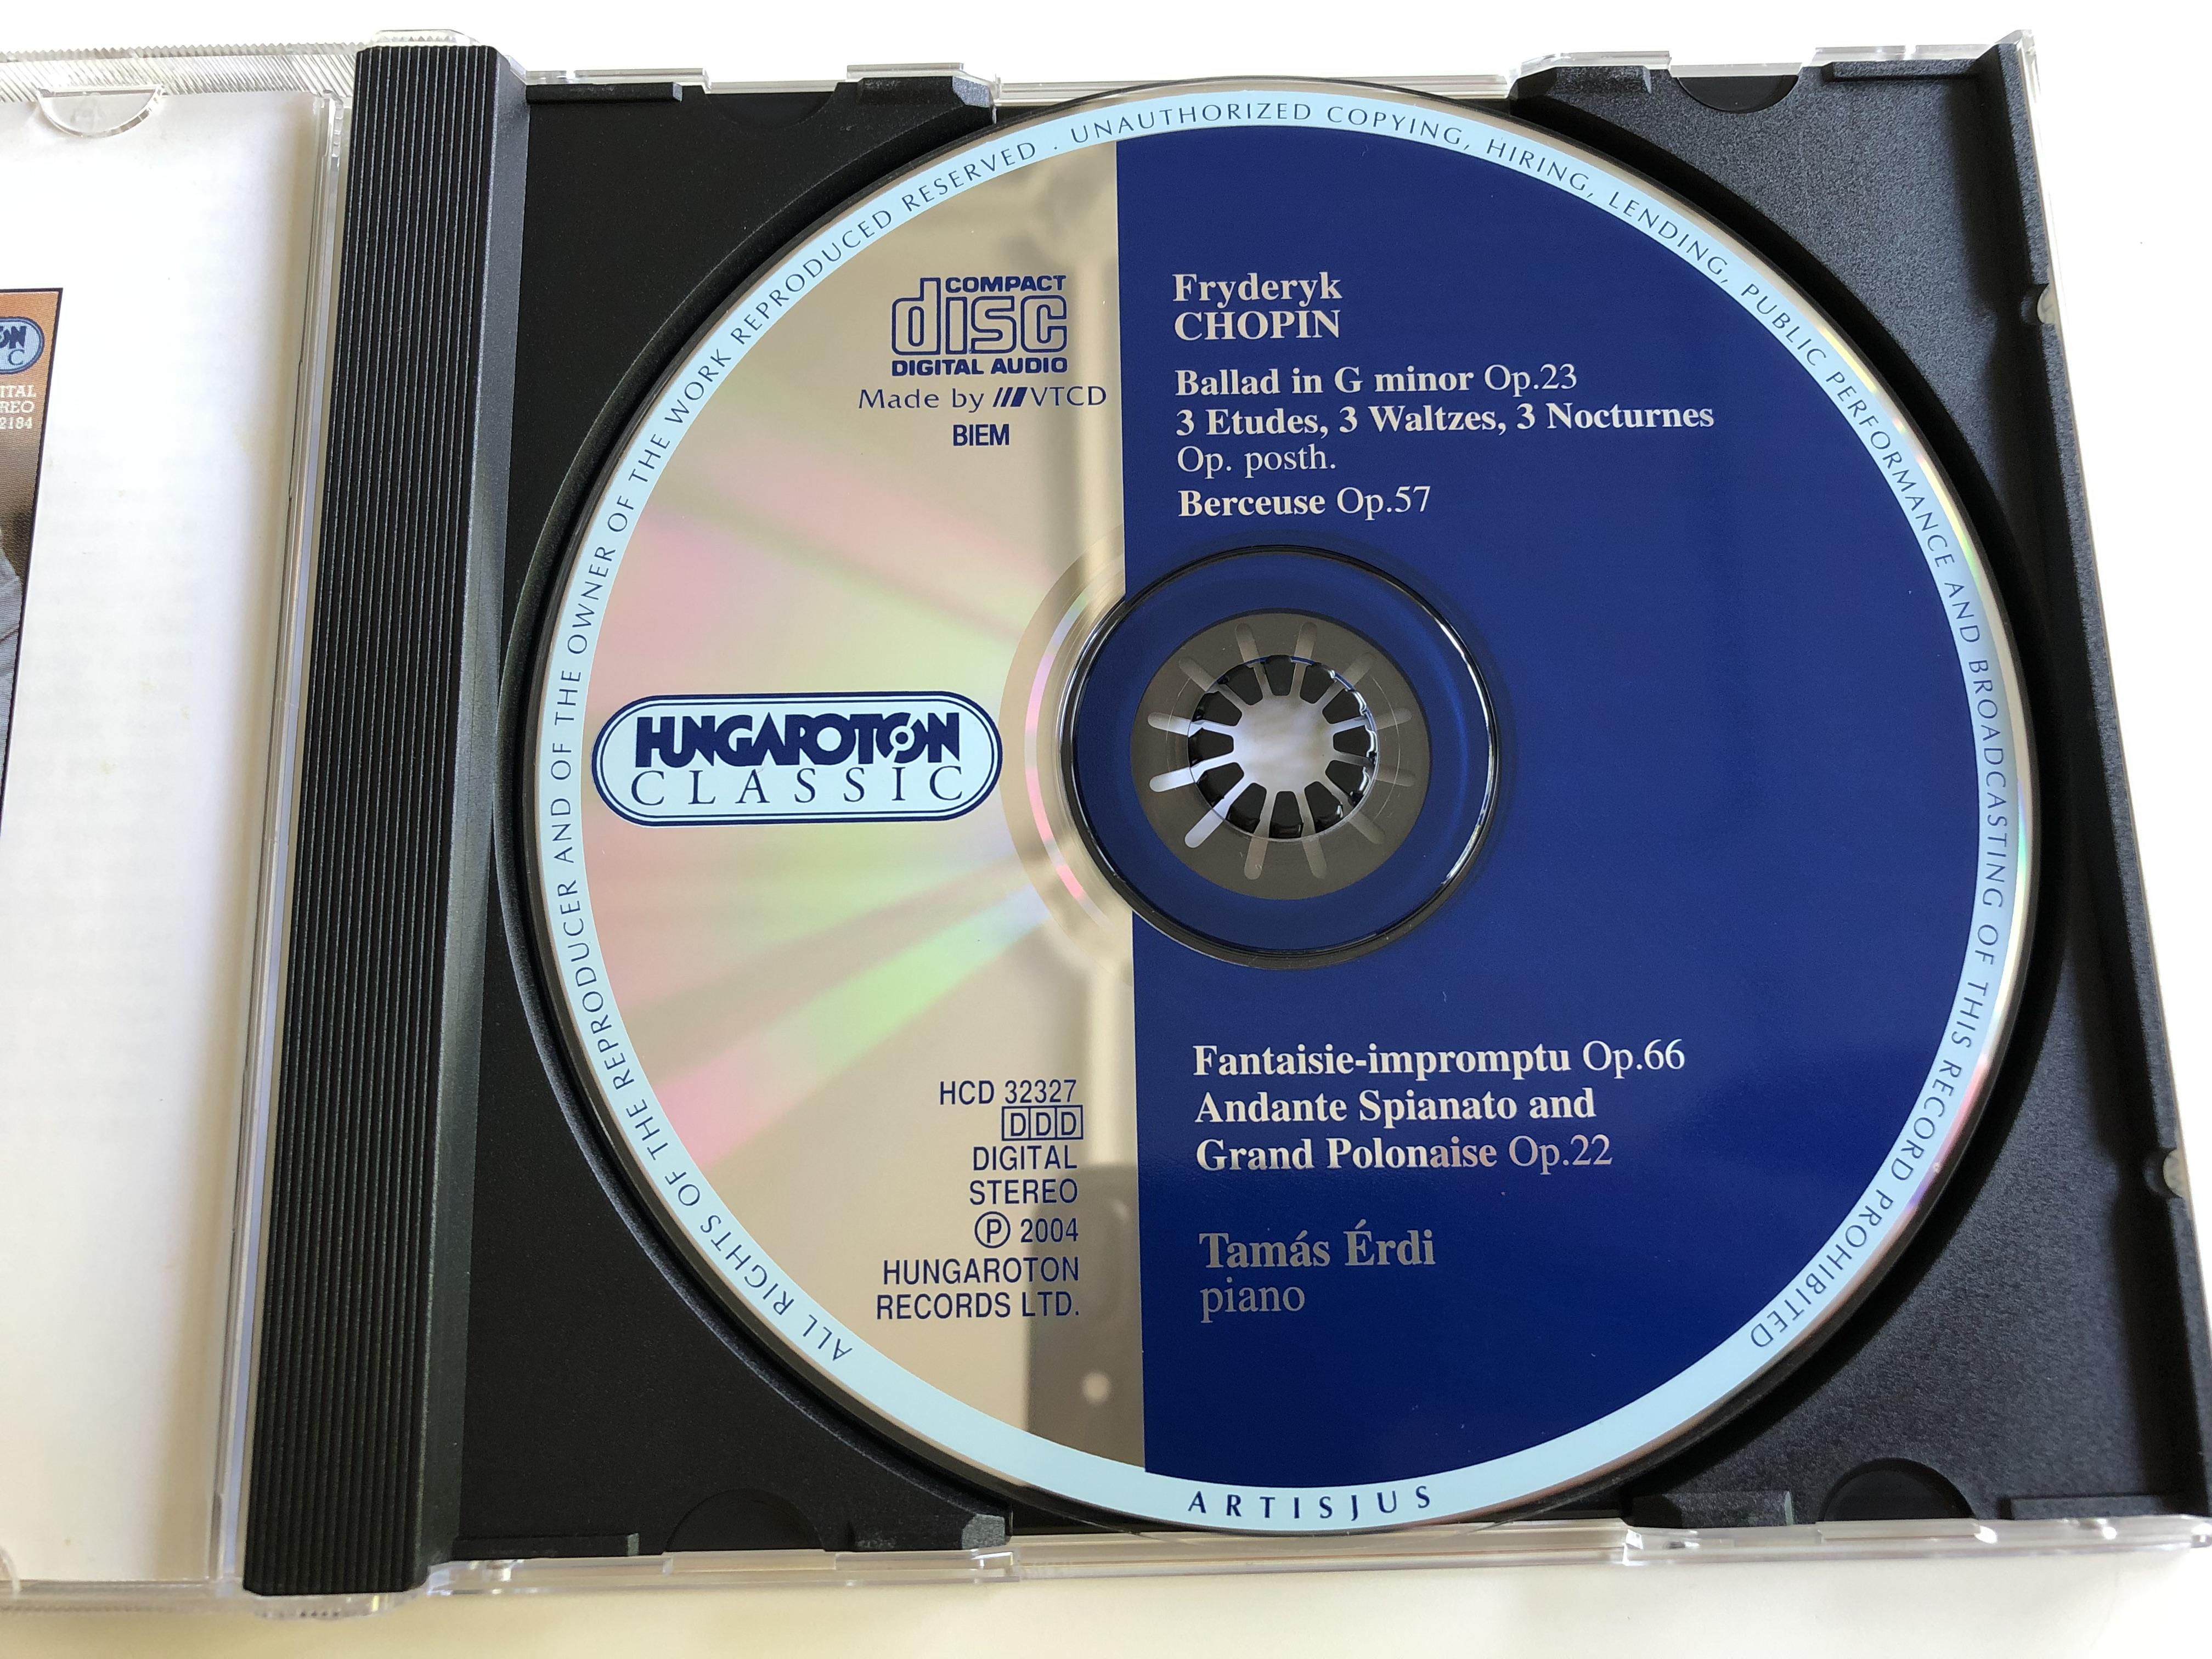 chopin-etudes-waltzes-nocturnes-tam-s-rdi-piano-hungaroton-classic-audio-cd-2004-hcd-32327-5-.jpg